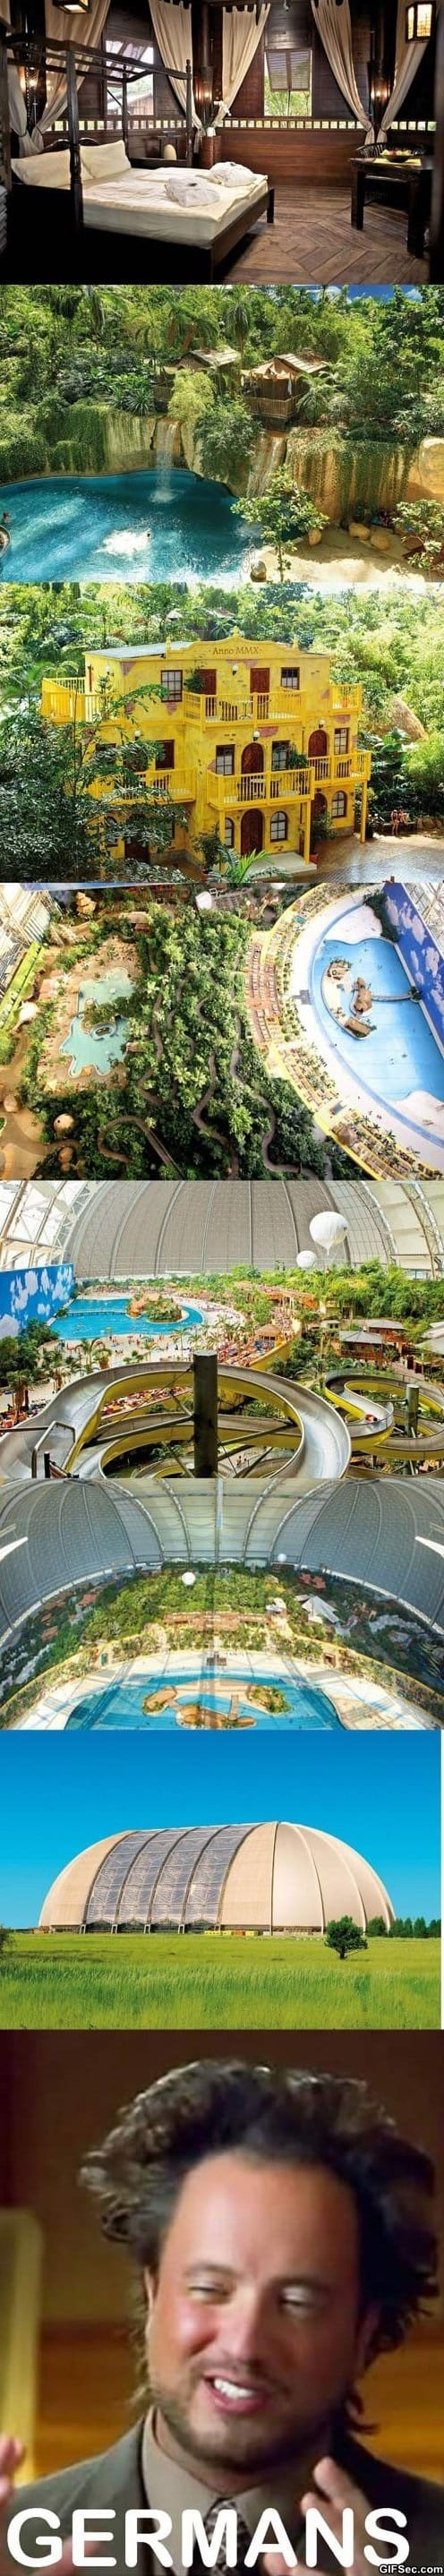 funny-biggest-indoor-beach-in-the-world